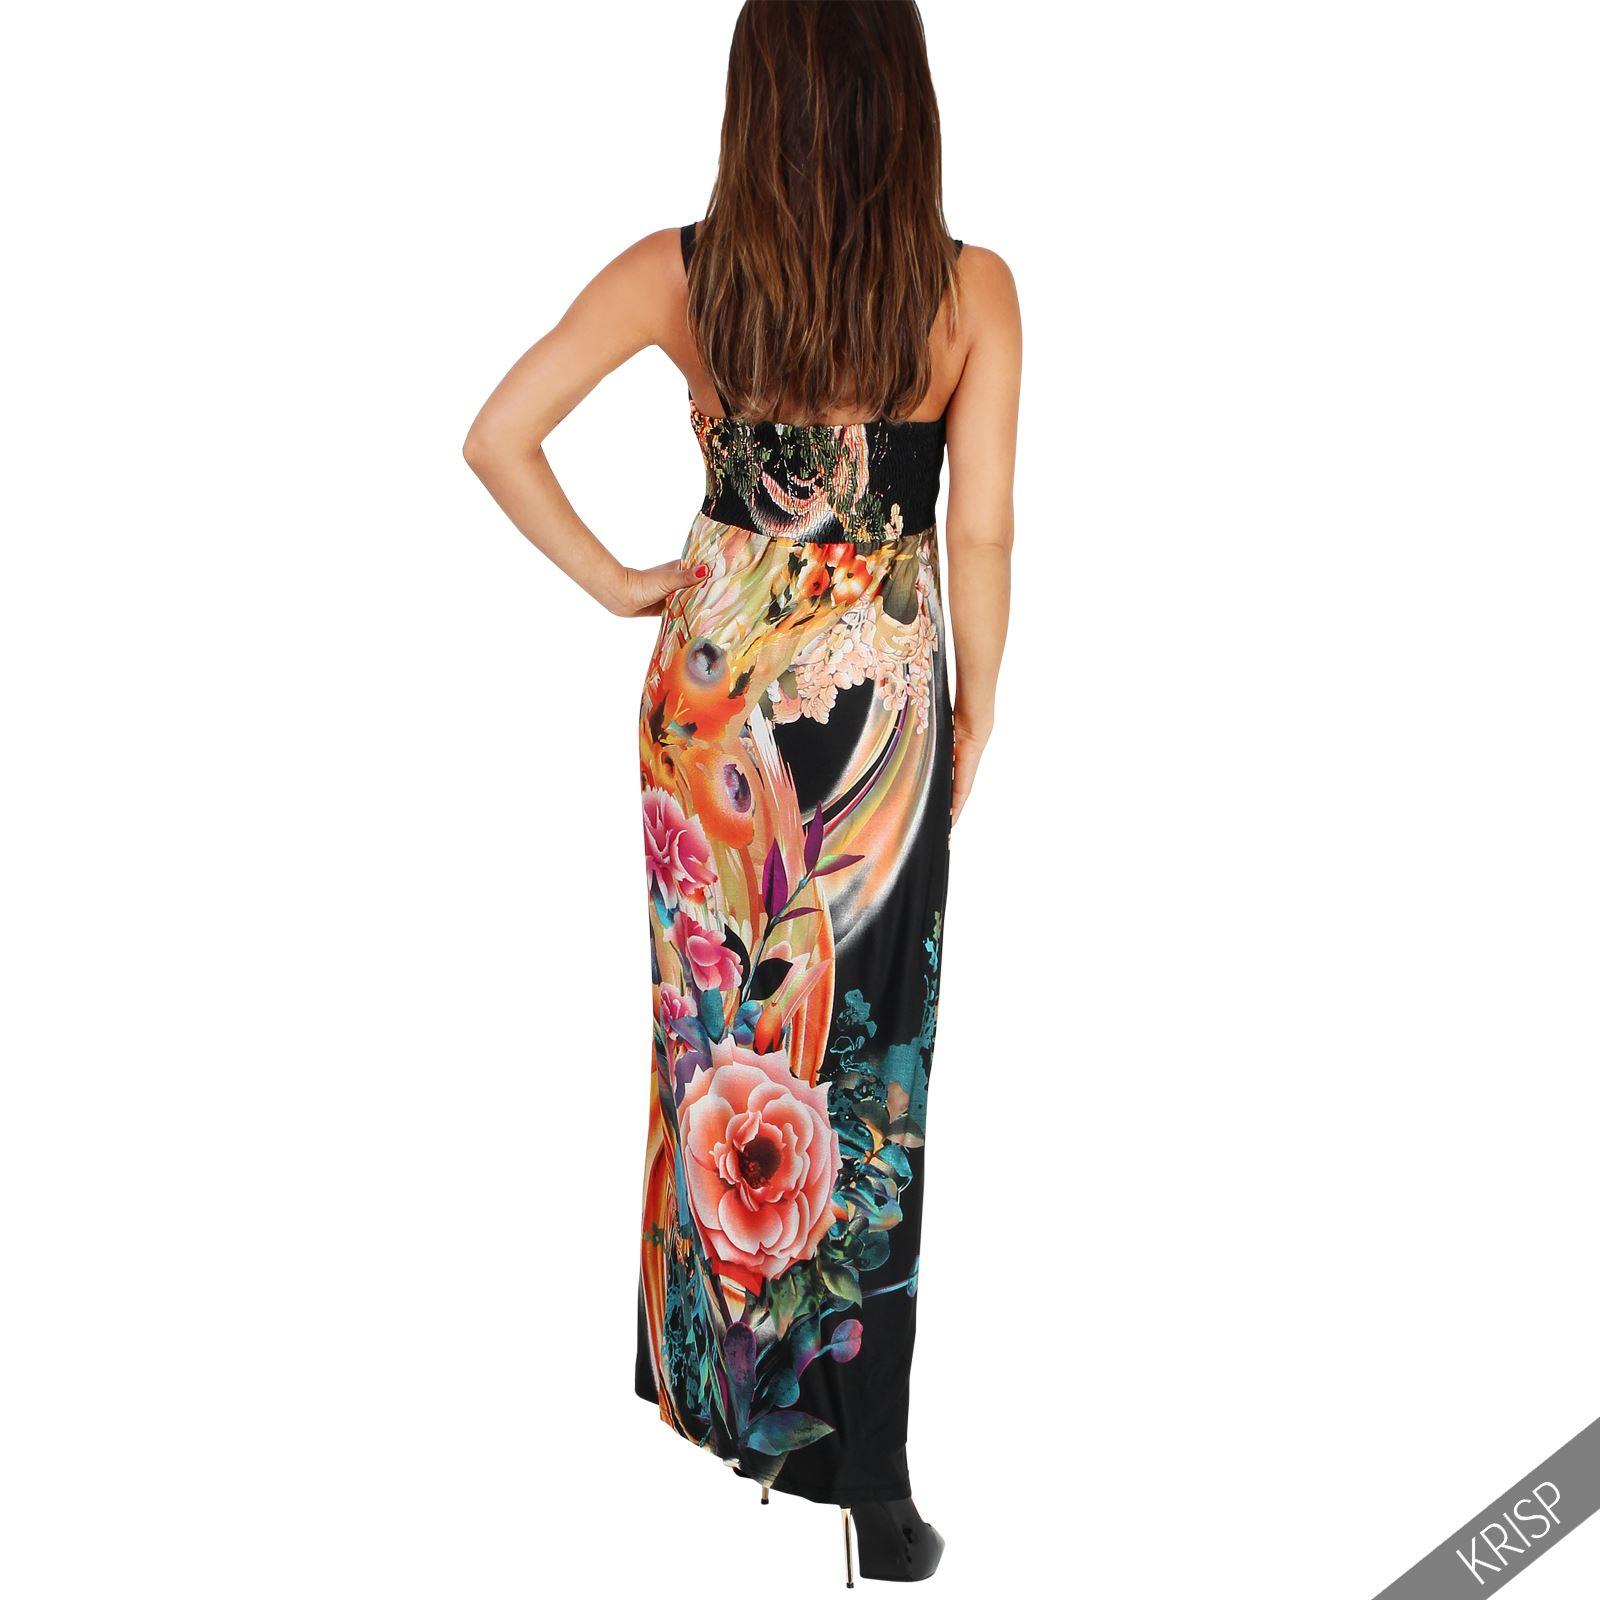 femme robe longue fleurie pliss e bretelle double taille empire cache coeur ebay. Black Bedroom Furniture Sets. Home Design Ideas